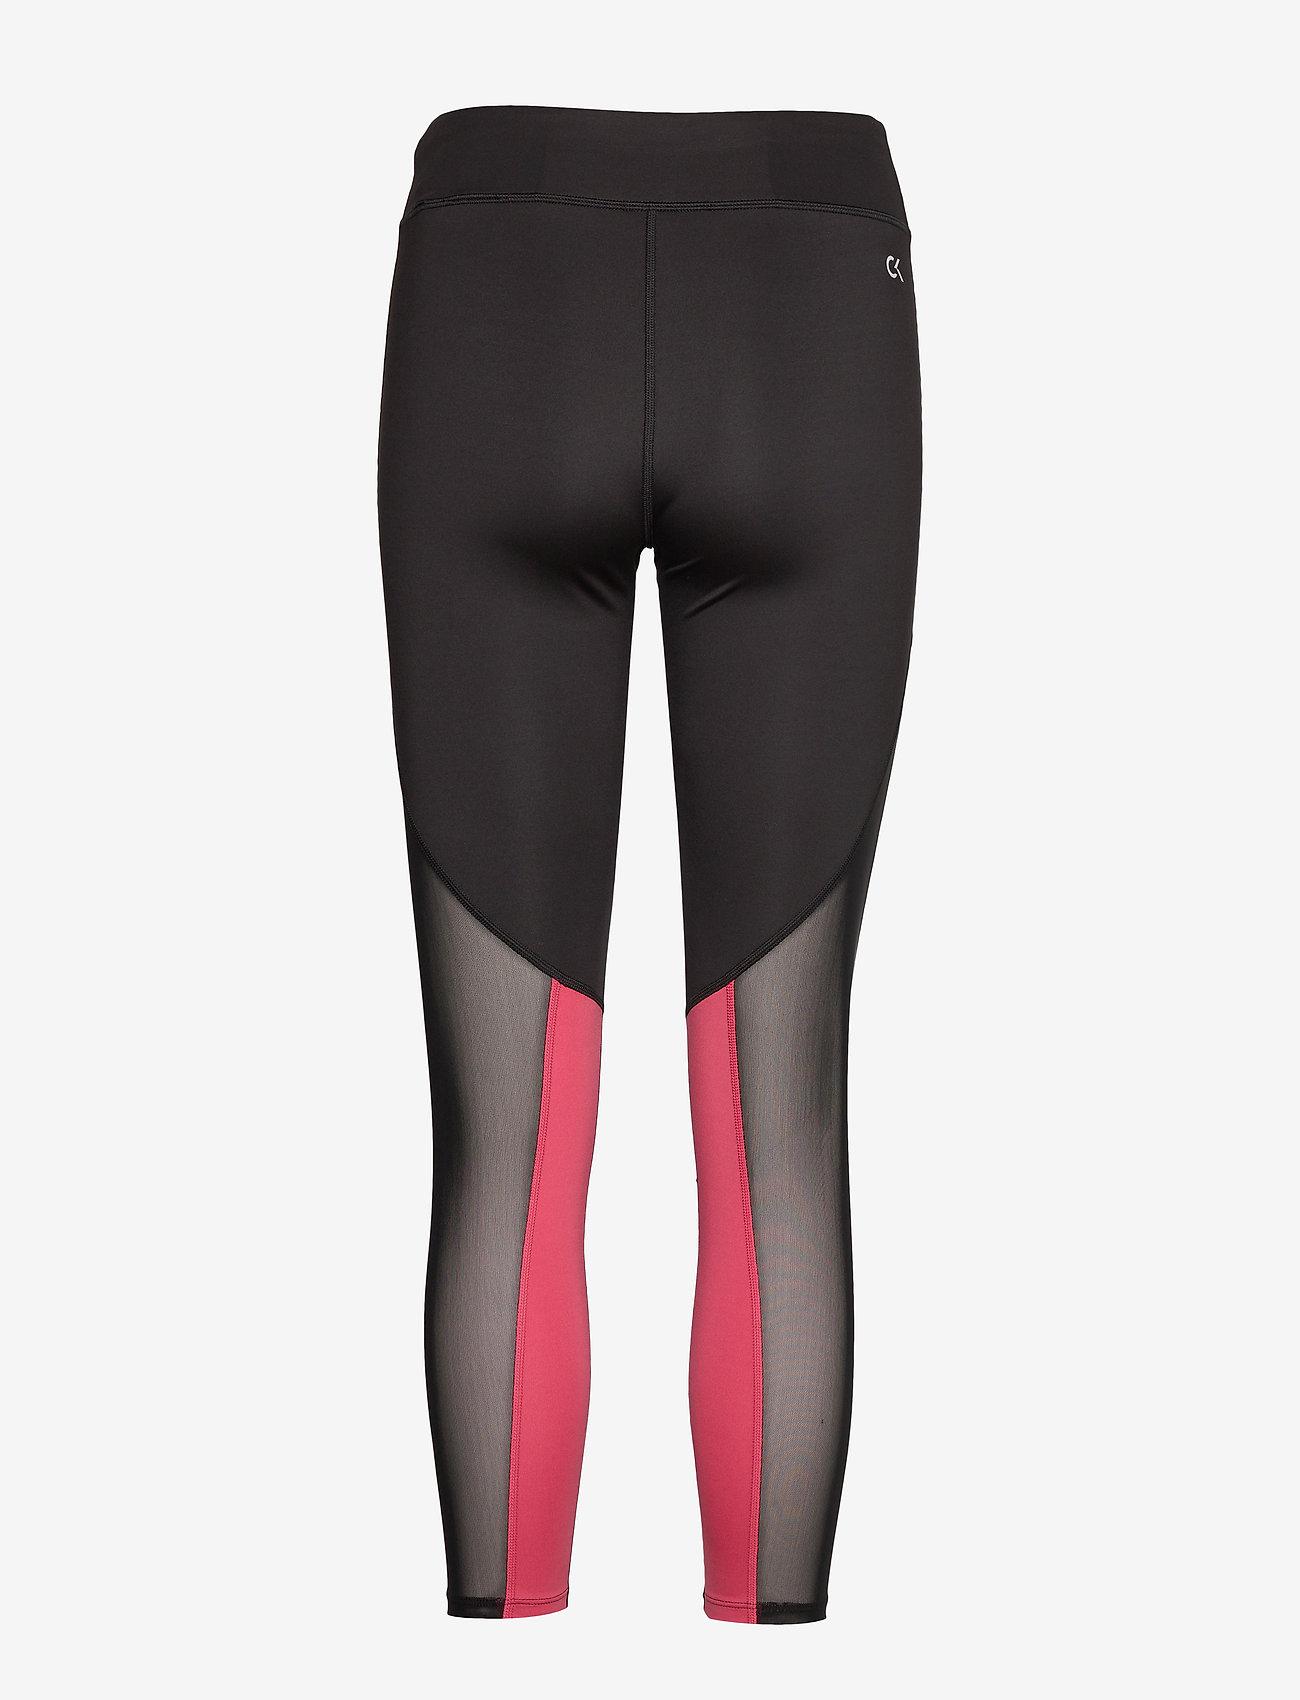 Calvin Klein Performance - 7/8 TIGHT - running & training tights - ck black - 1